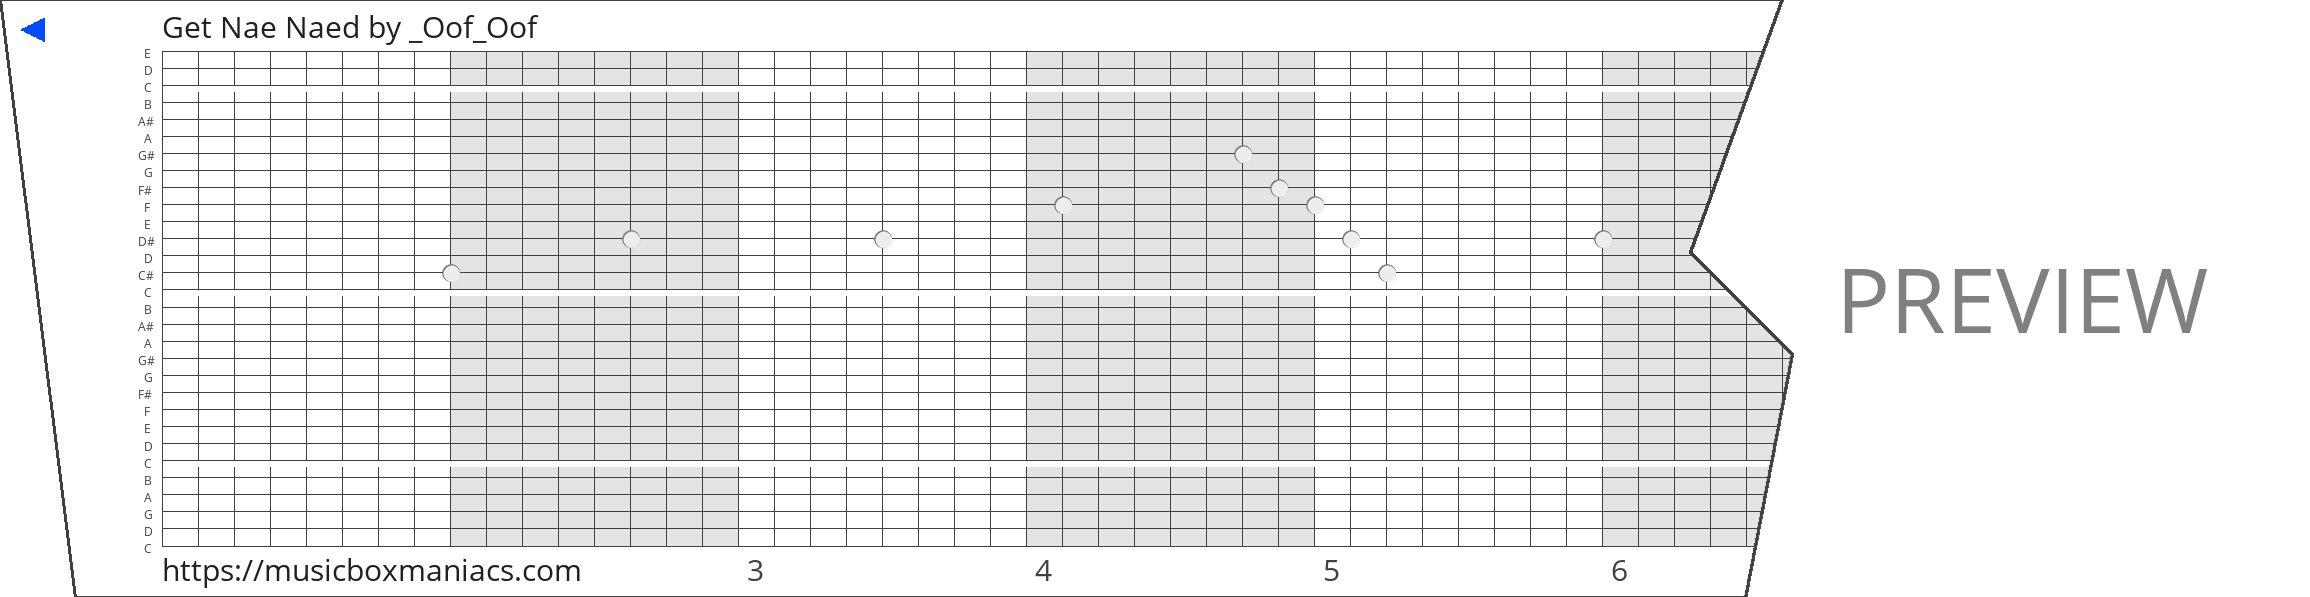 Get Nae Naed 30 note music box paper strip